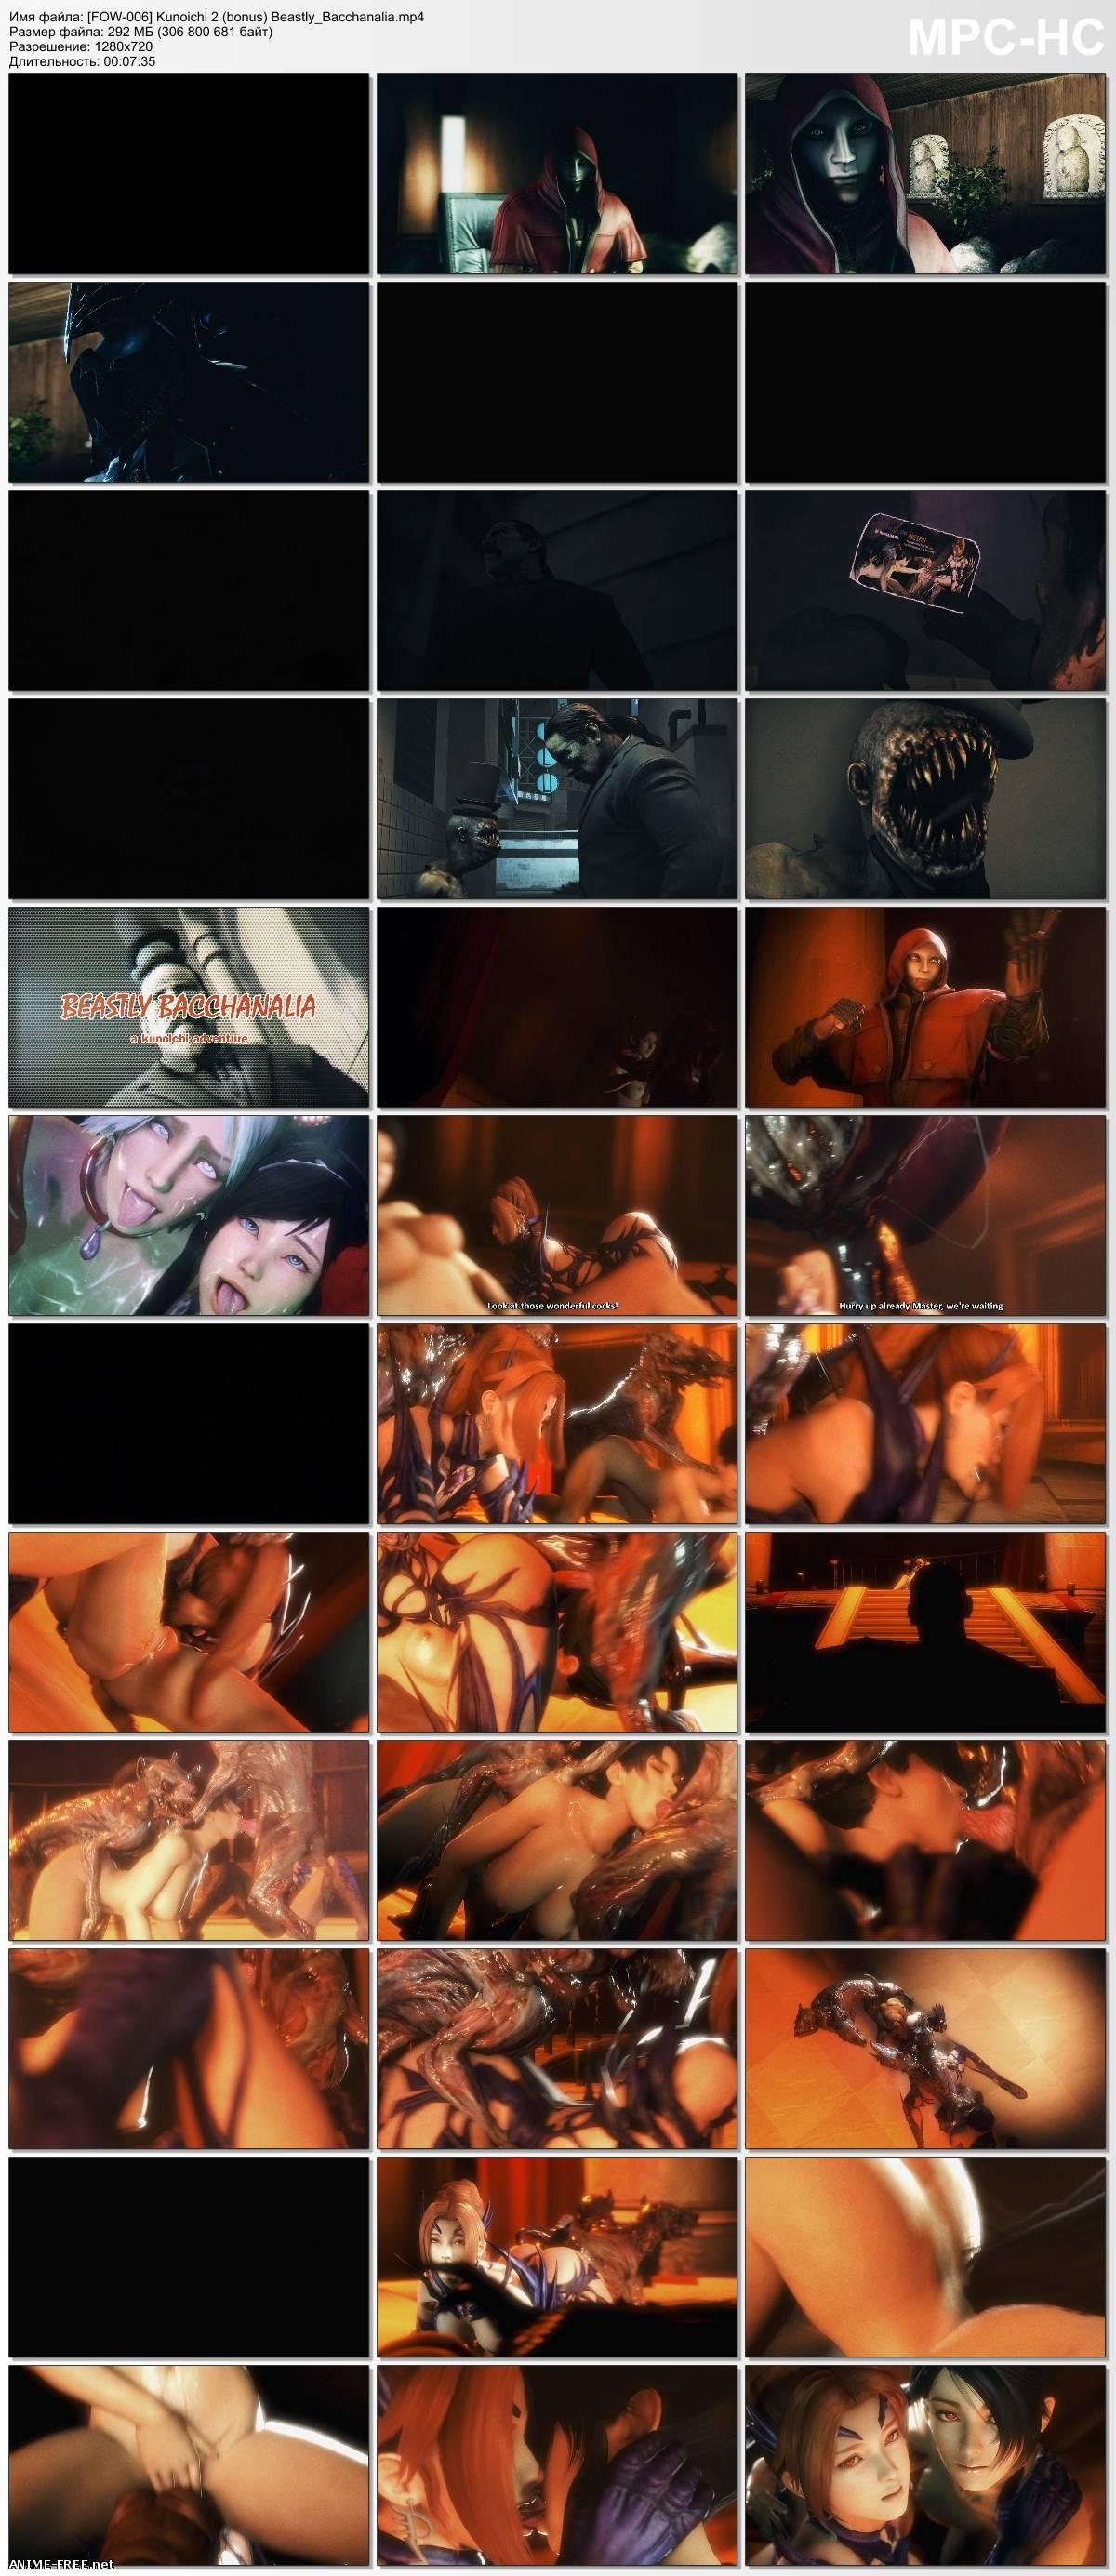 Kunoichi 2: Fall of the Shrinemaiden + Beastly Bacchanalia(Bonus) [2015-2016] [Uncen] [720p] [JAP,ENG] 3D-Hentai